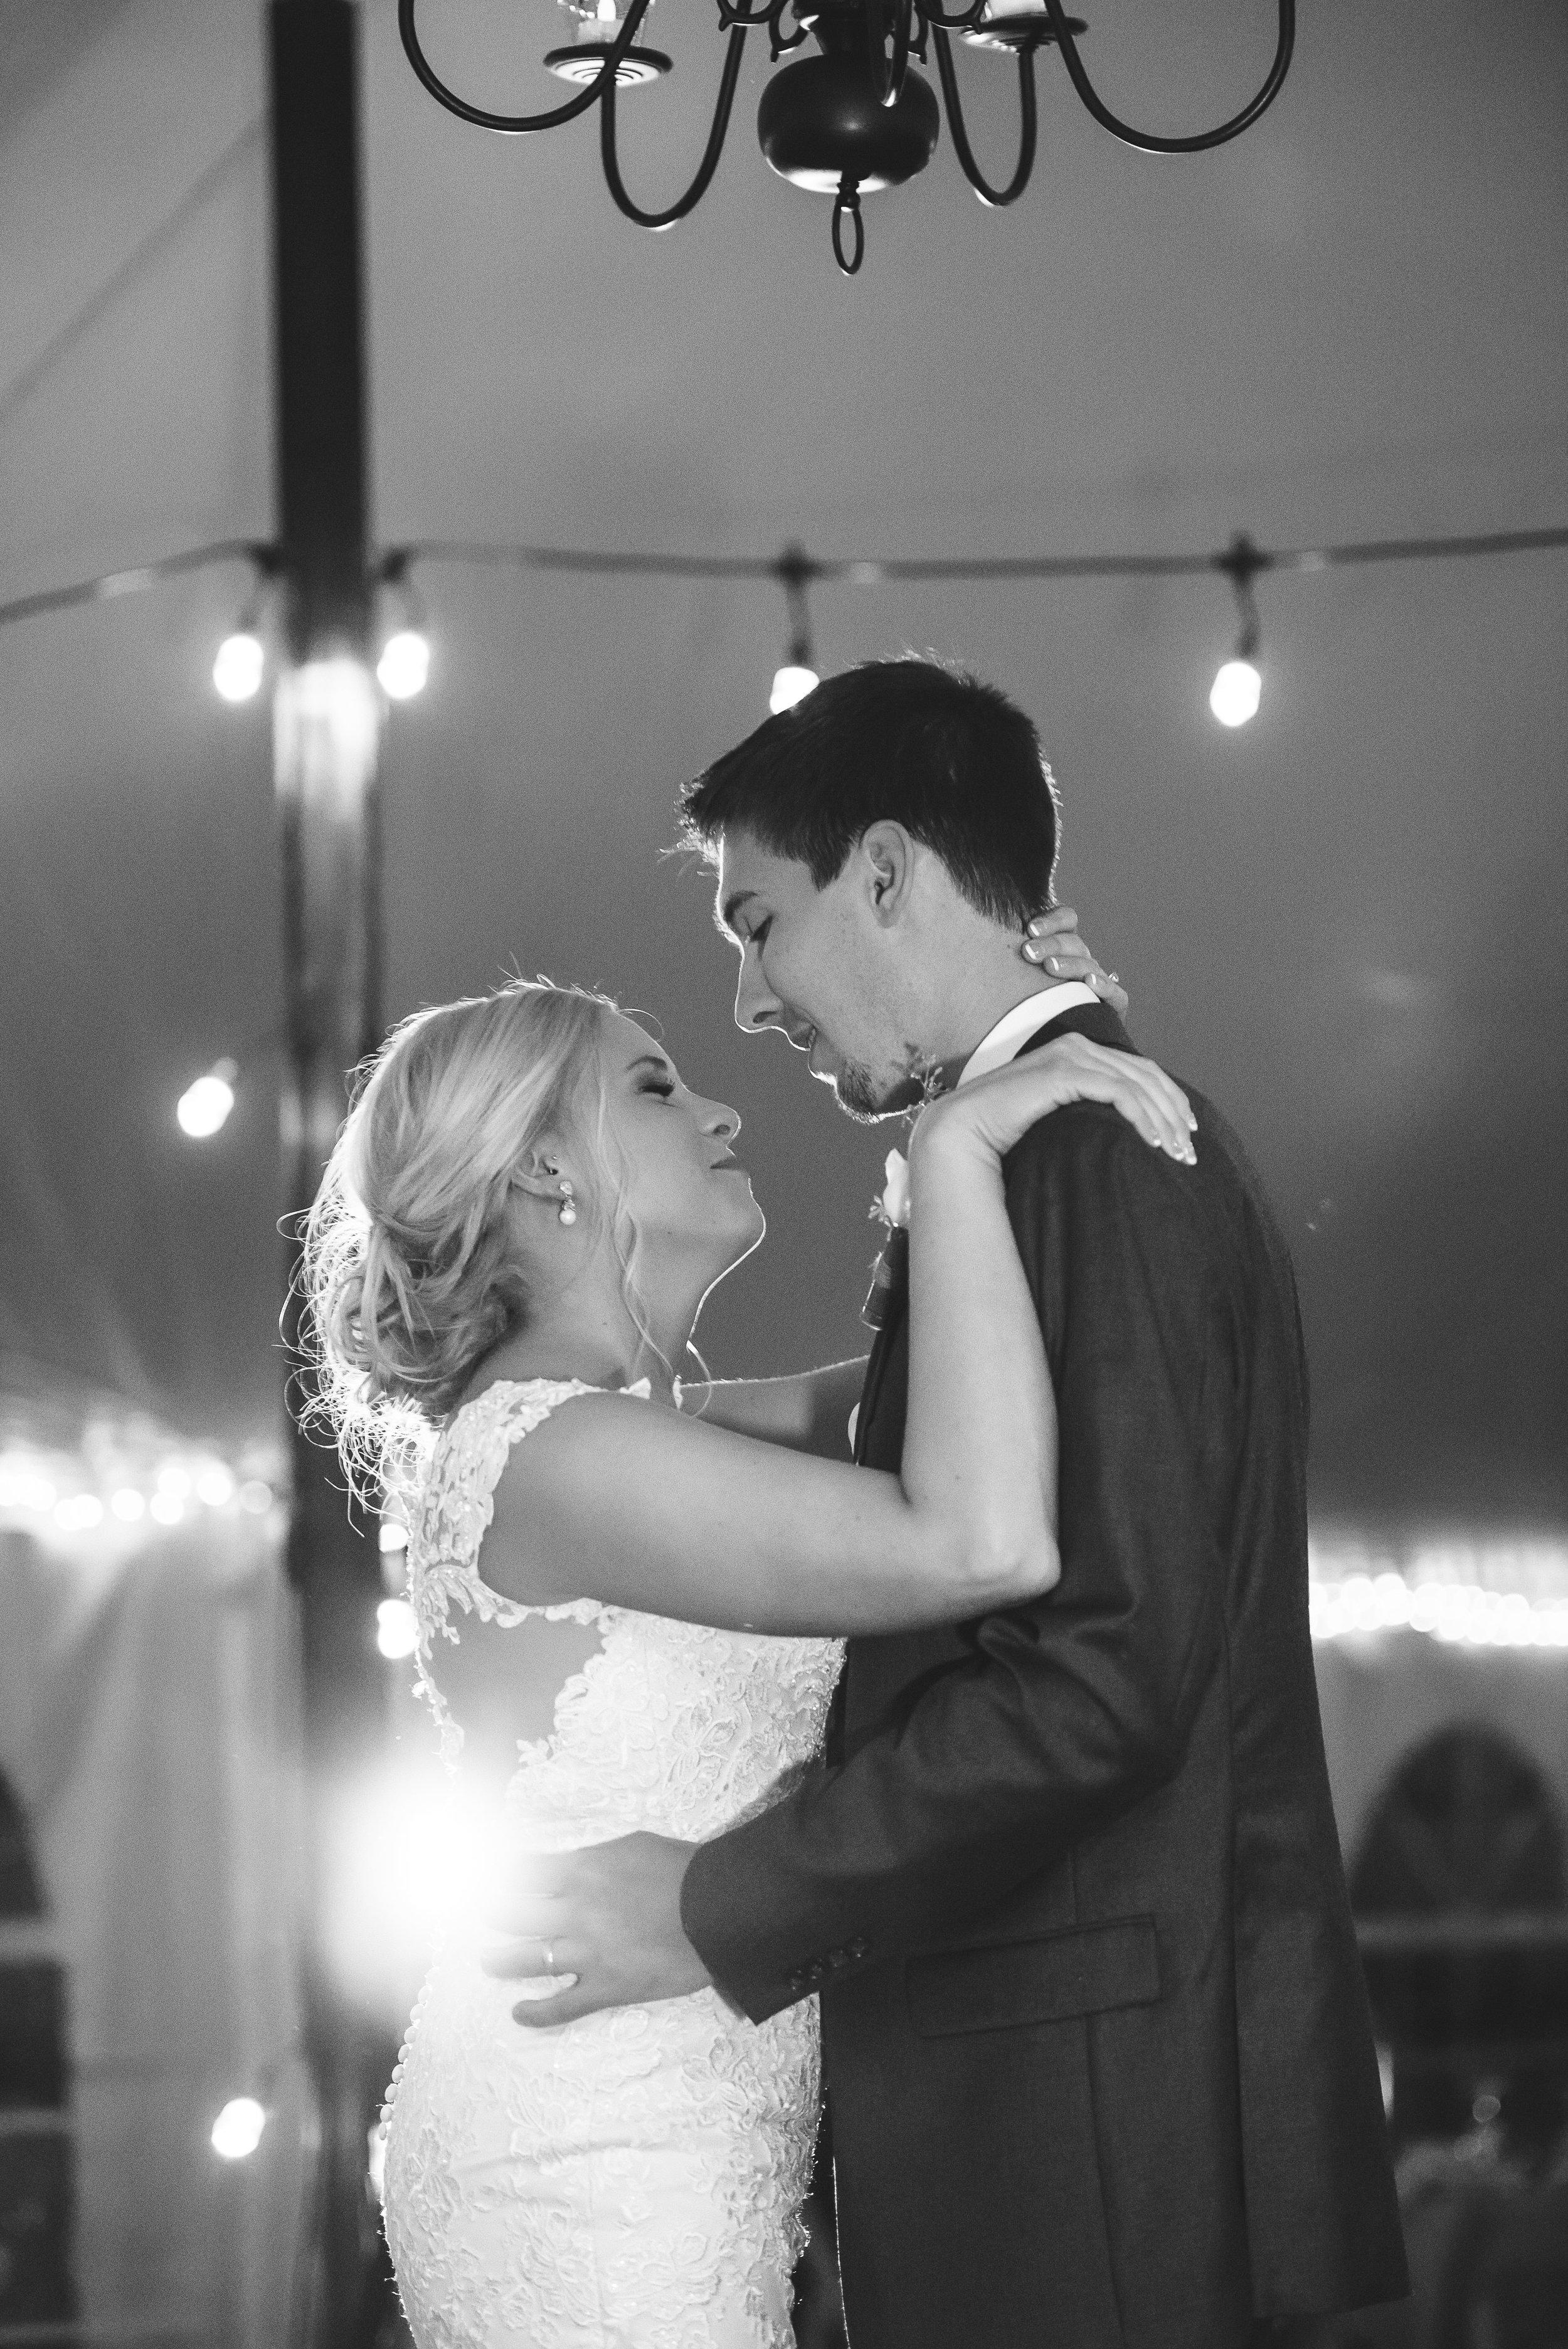 weddingbowlinggreenphotographercassieadkins_786.JPG